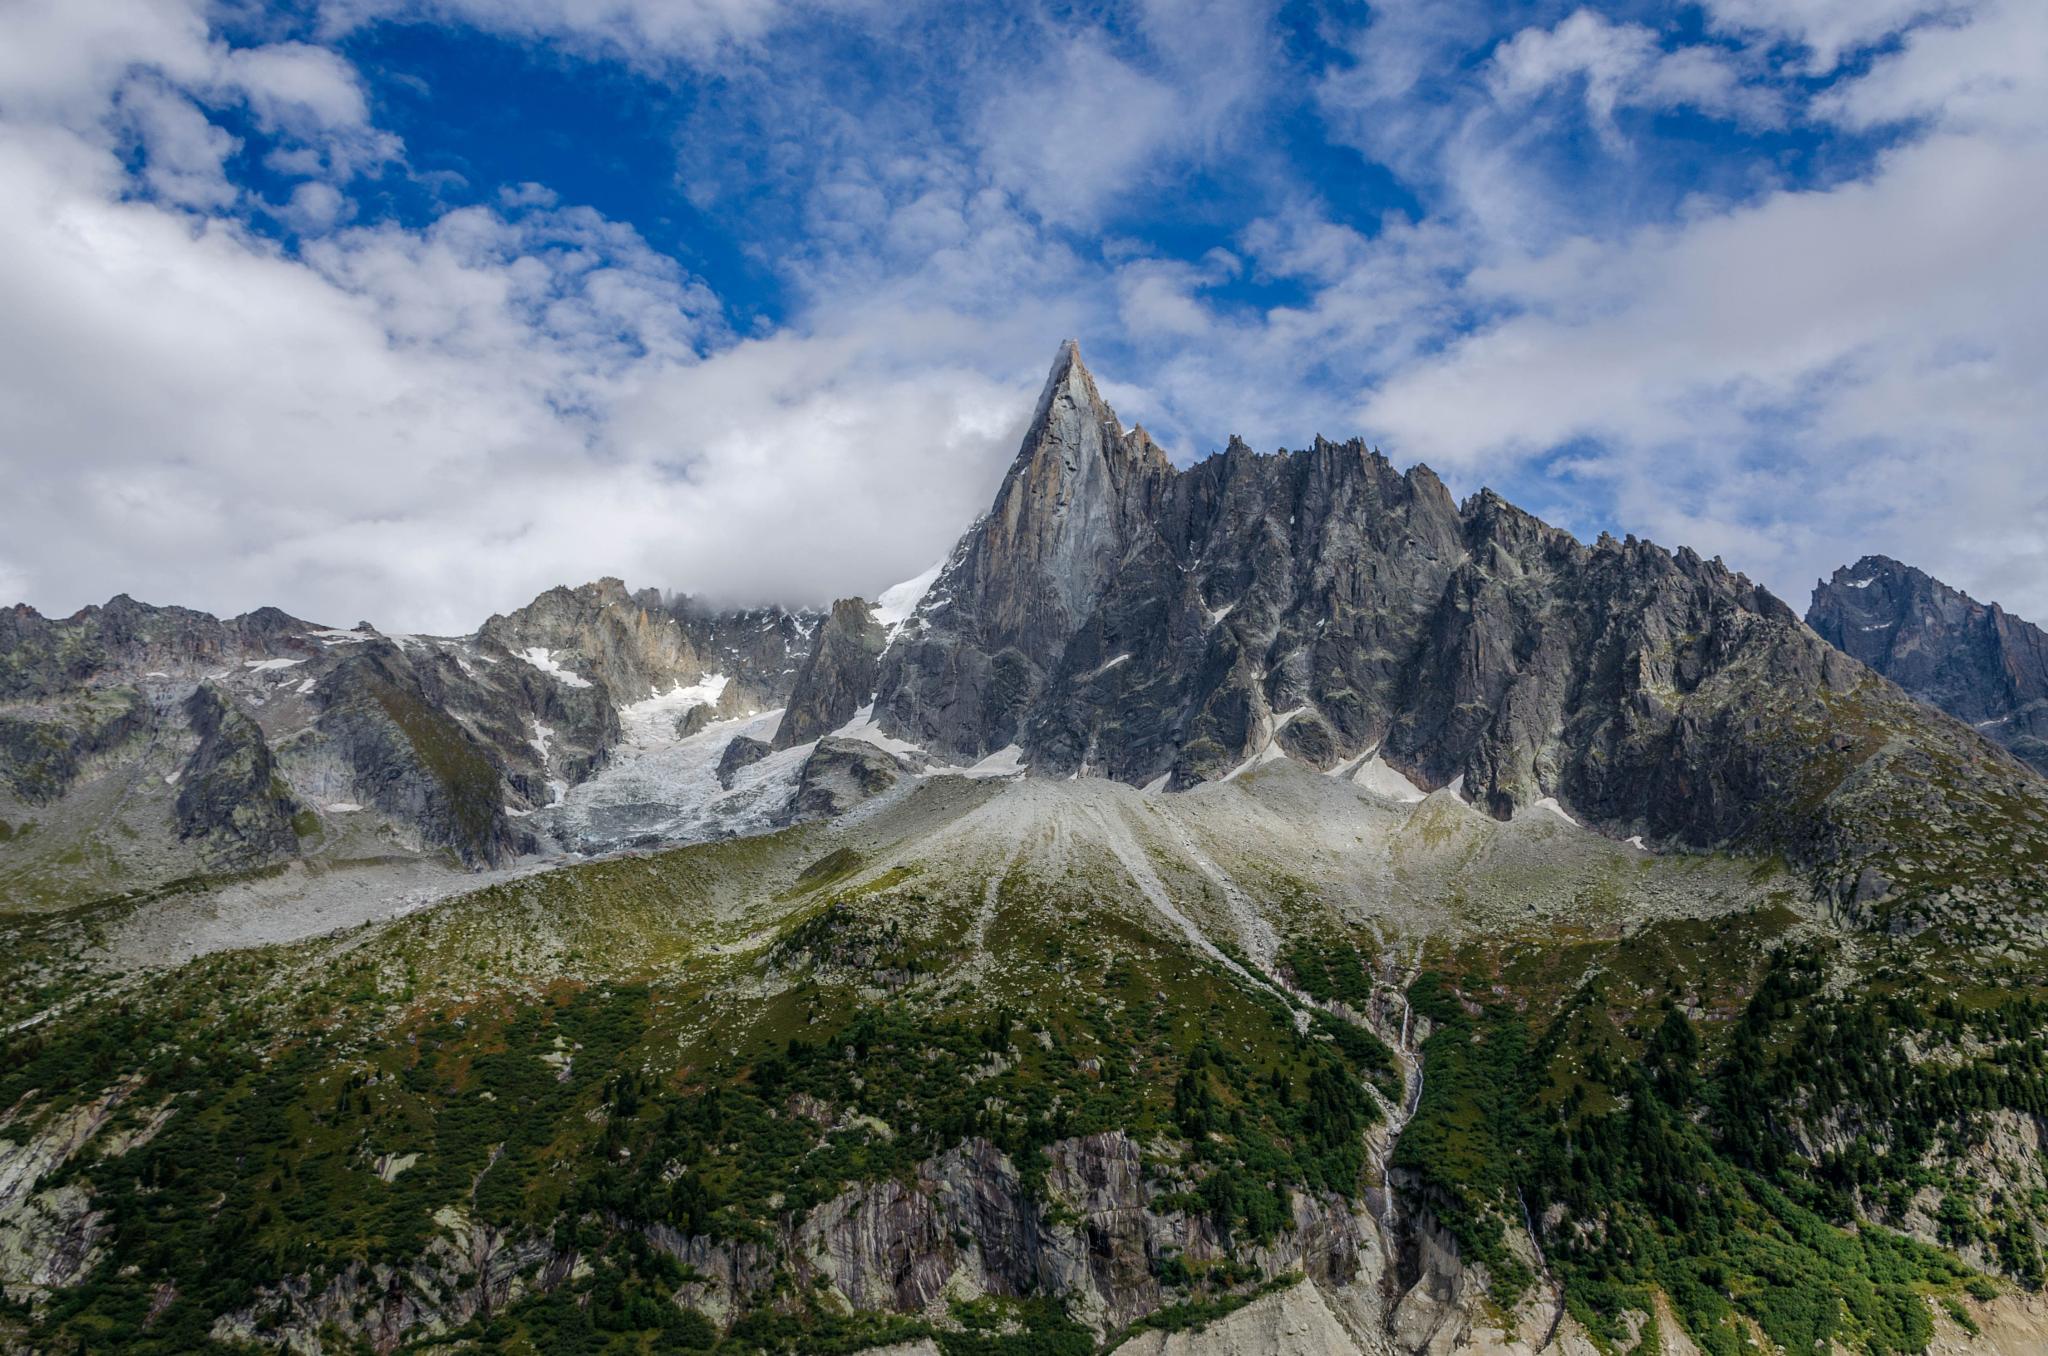 Les Alpes by AteliersClaudeBernard